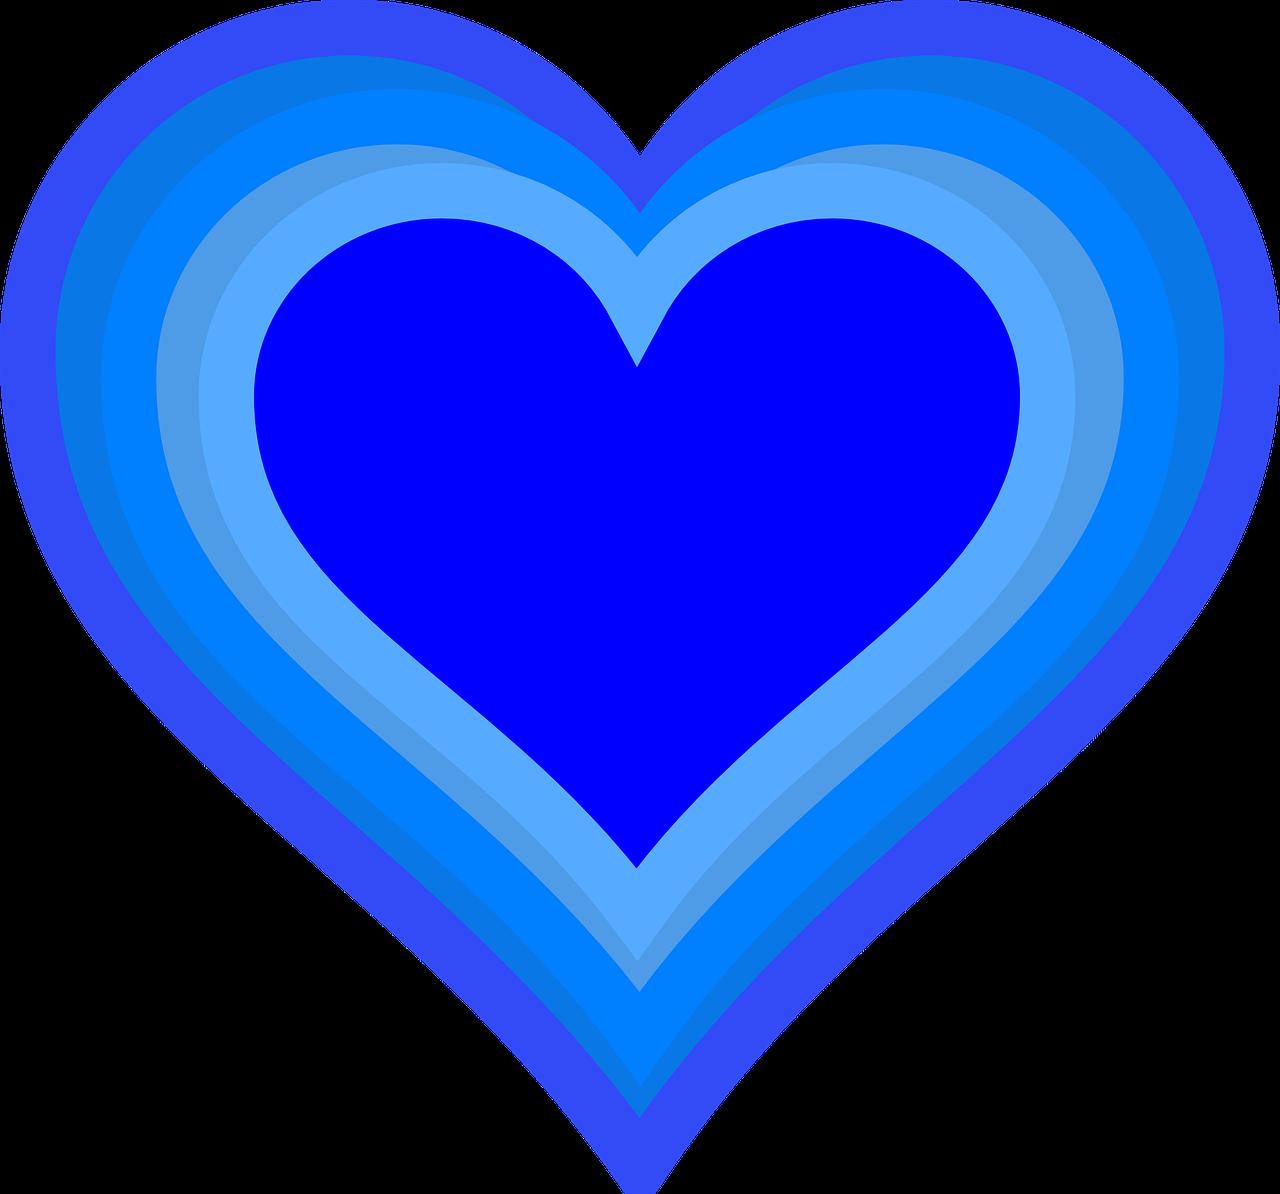 картинки сердечки синего цвета некоторые кошки